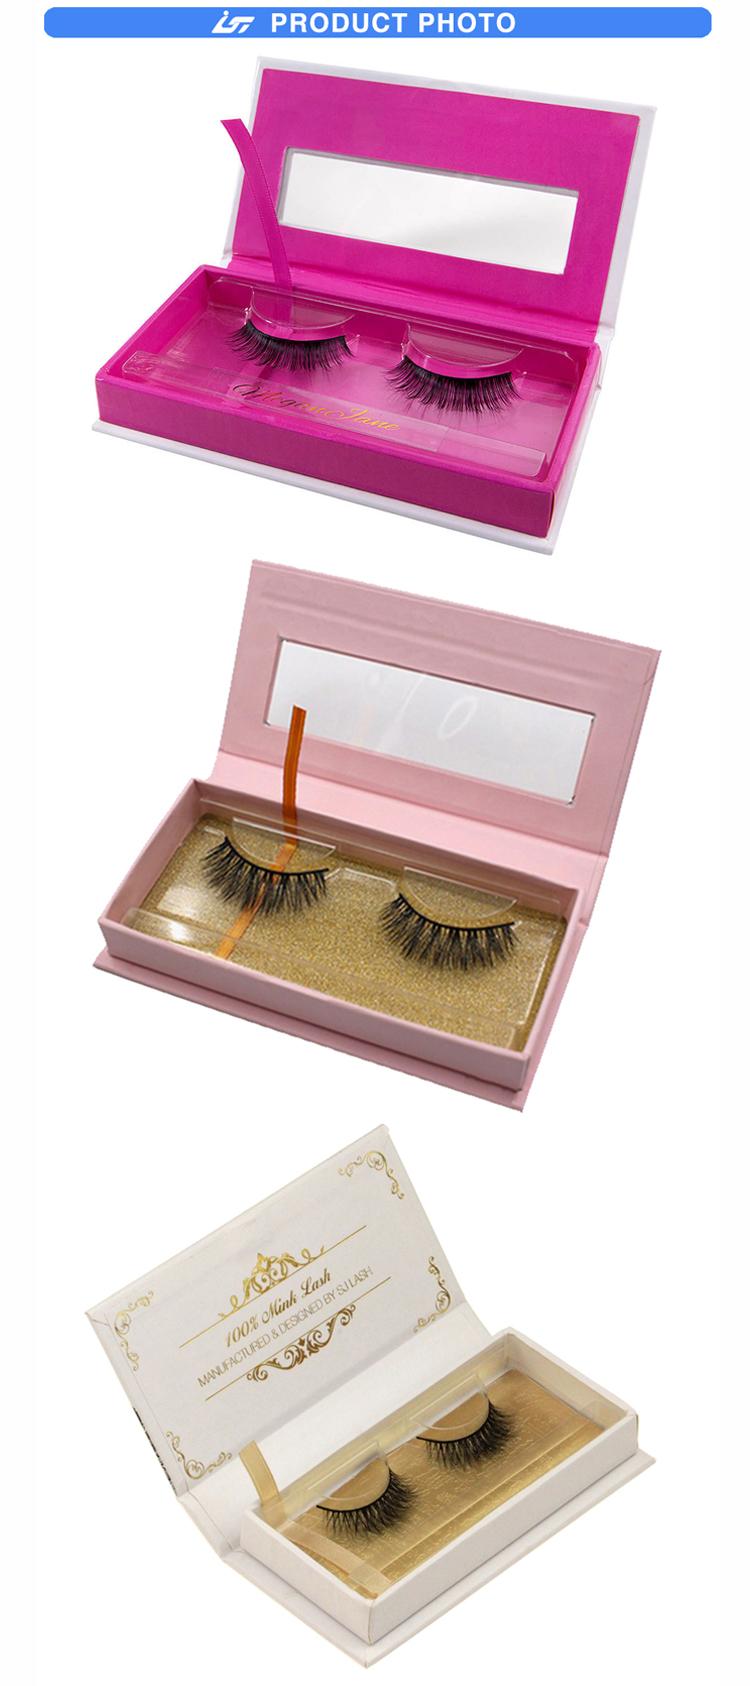 Kustom Magnetik Paket Kotak Glitter Bulu Mata Kemasan